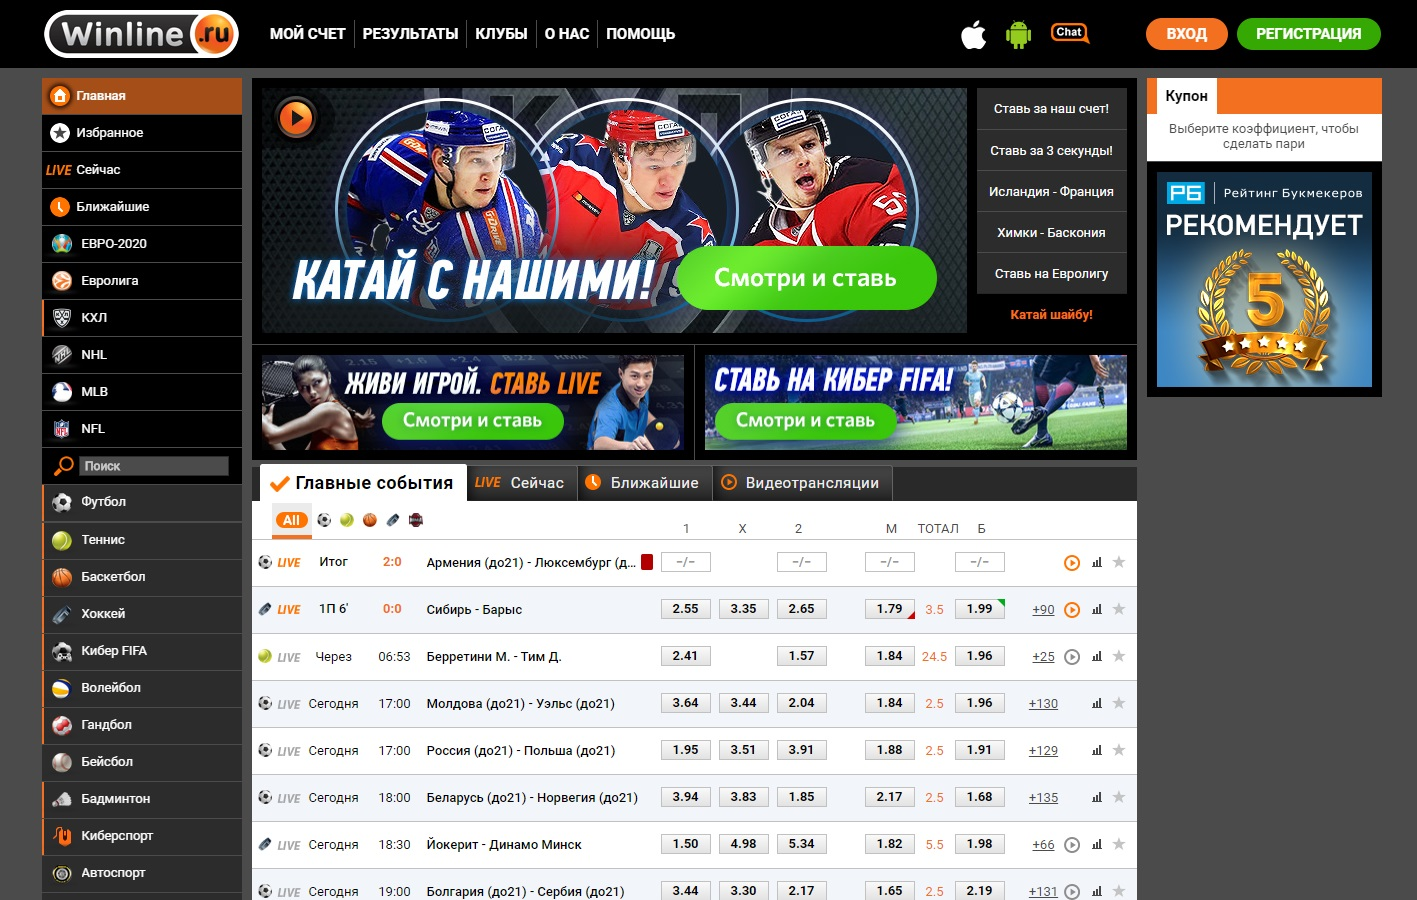 Winline ru - официальный сайт БК конторы